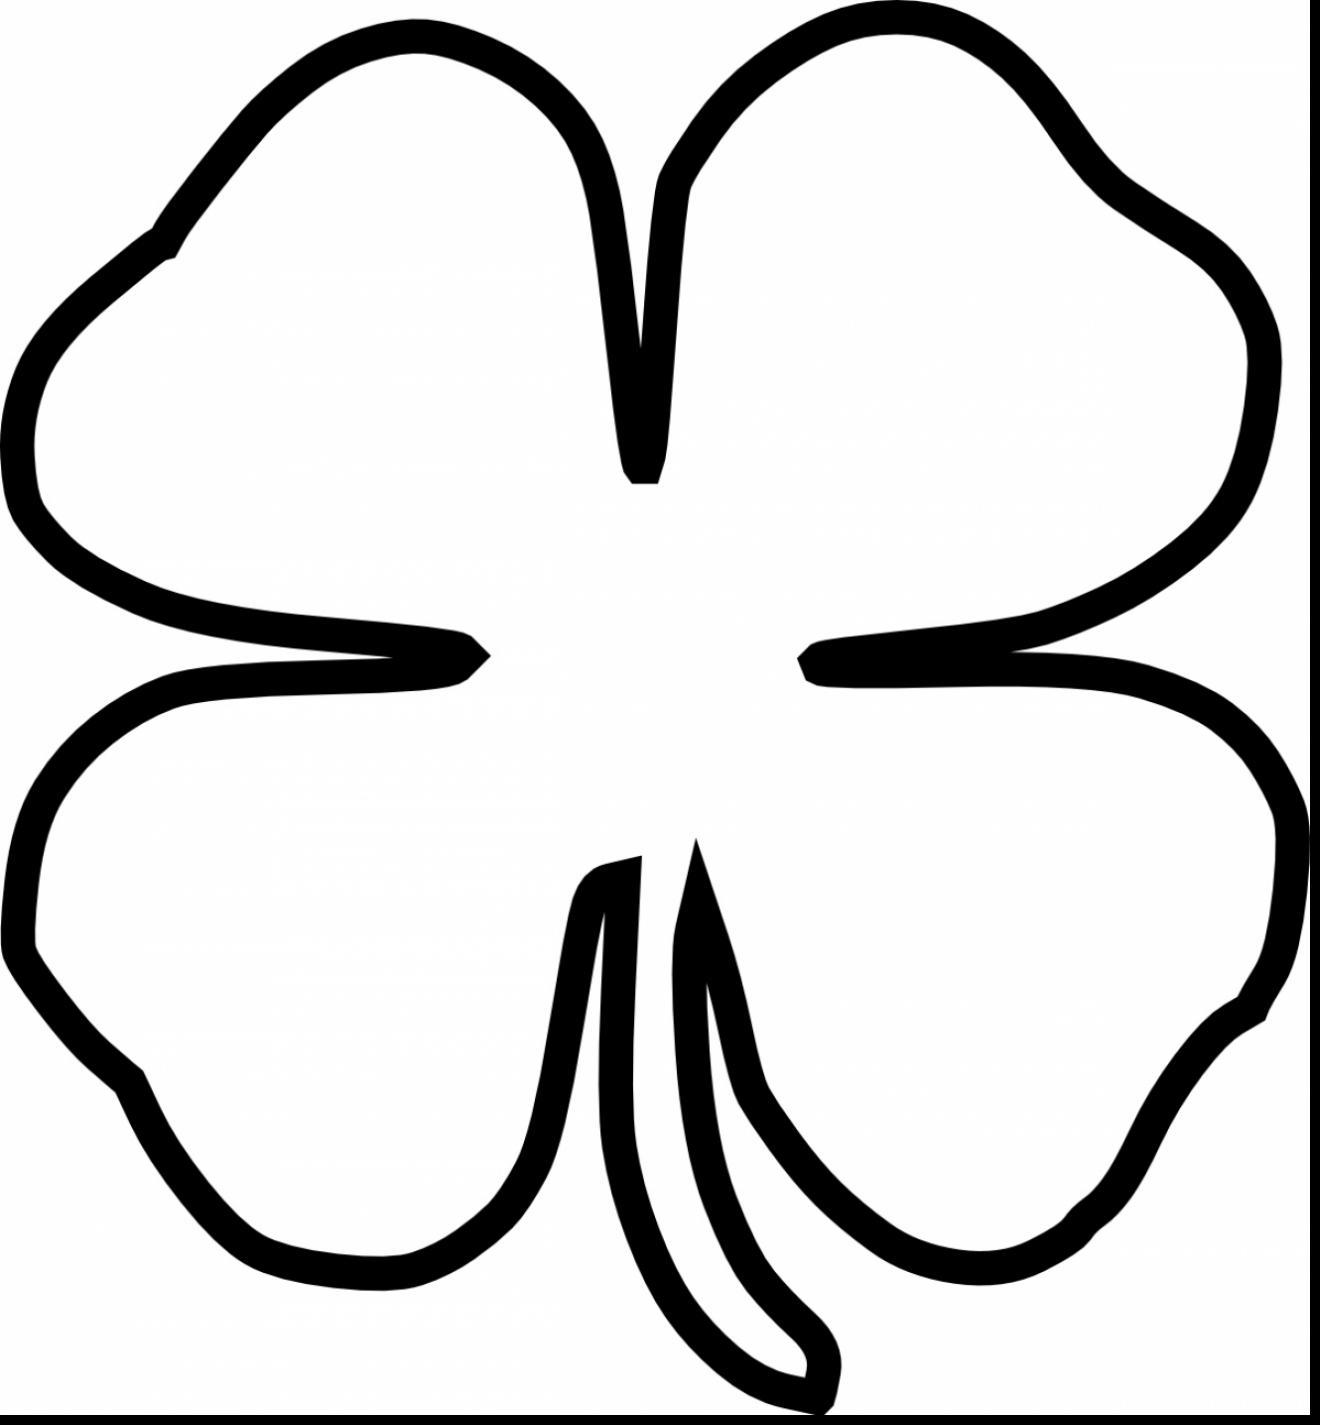 1320x1425 4 Leaf Clover Clipart